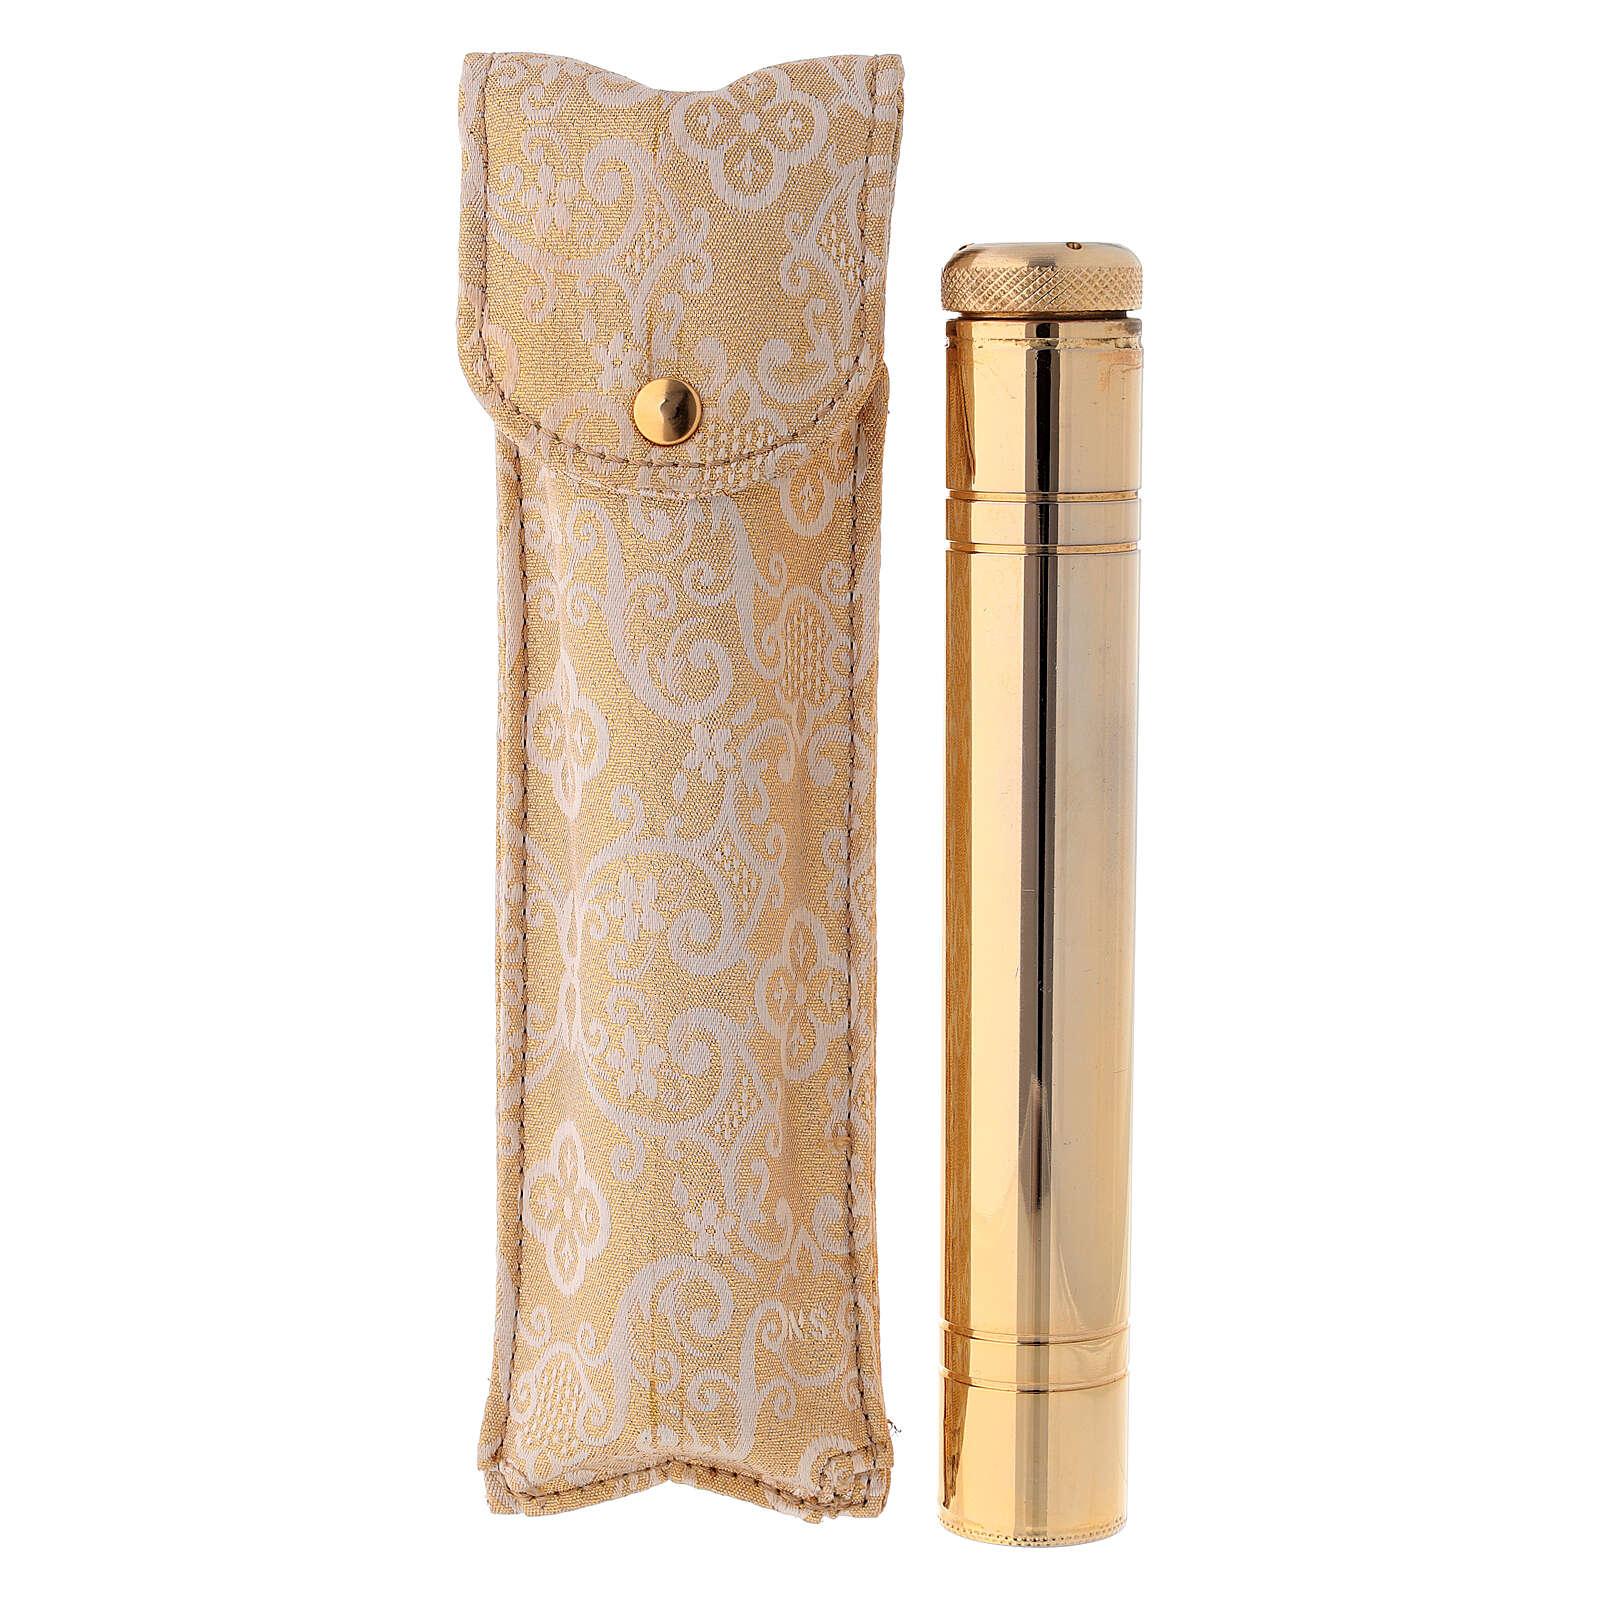 Sprinkler in brass, golden tone with jacquard golden case, 16 cm 3